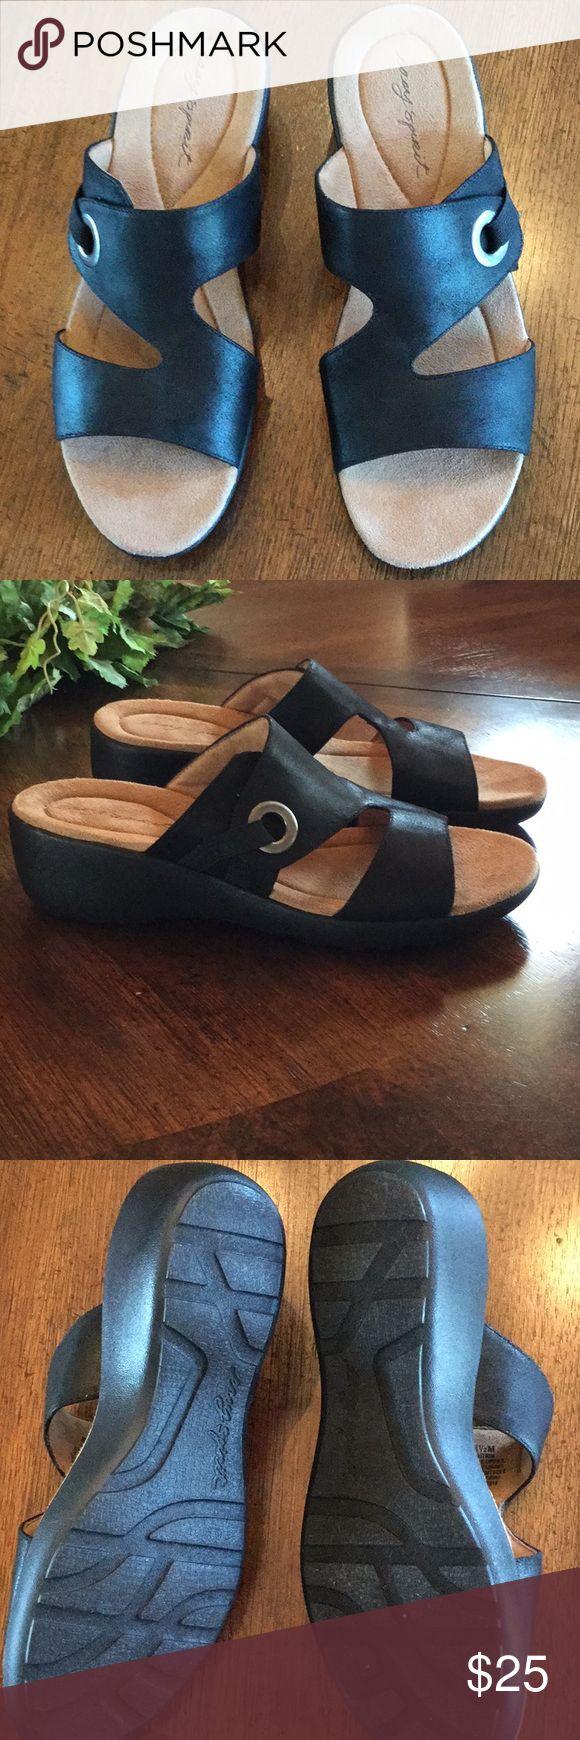 Easy spirit sandals New! Never worn Easy Spirit Shoes Sandals